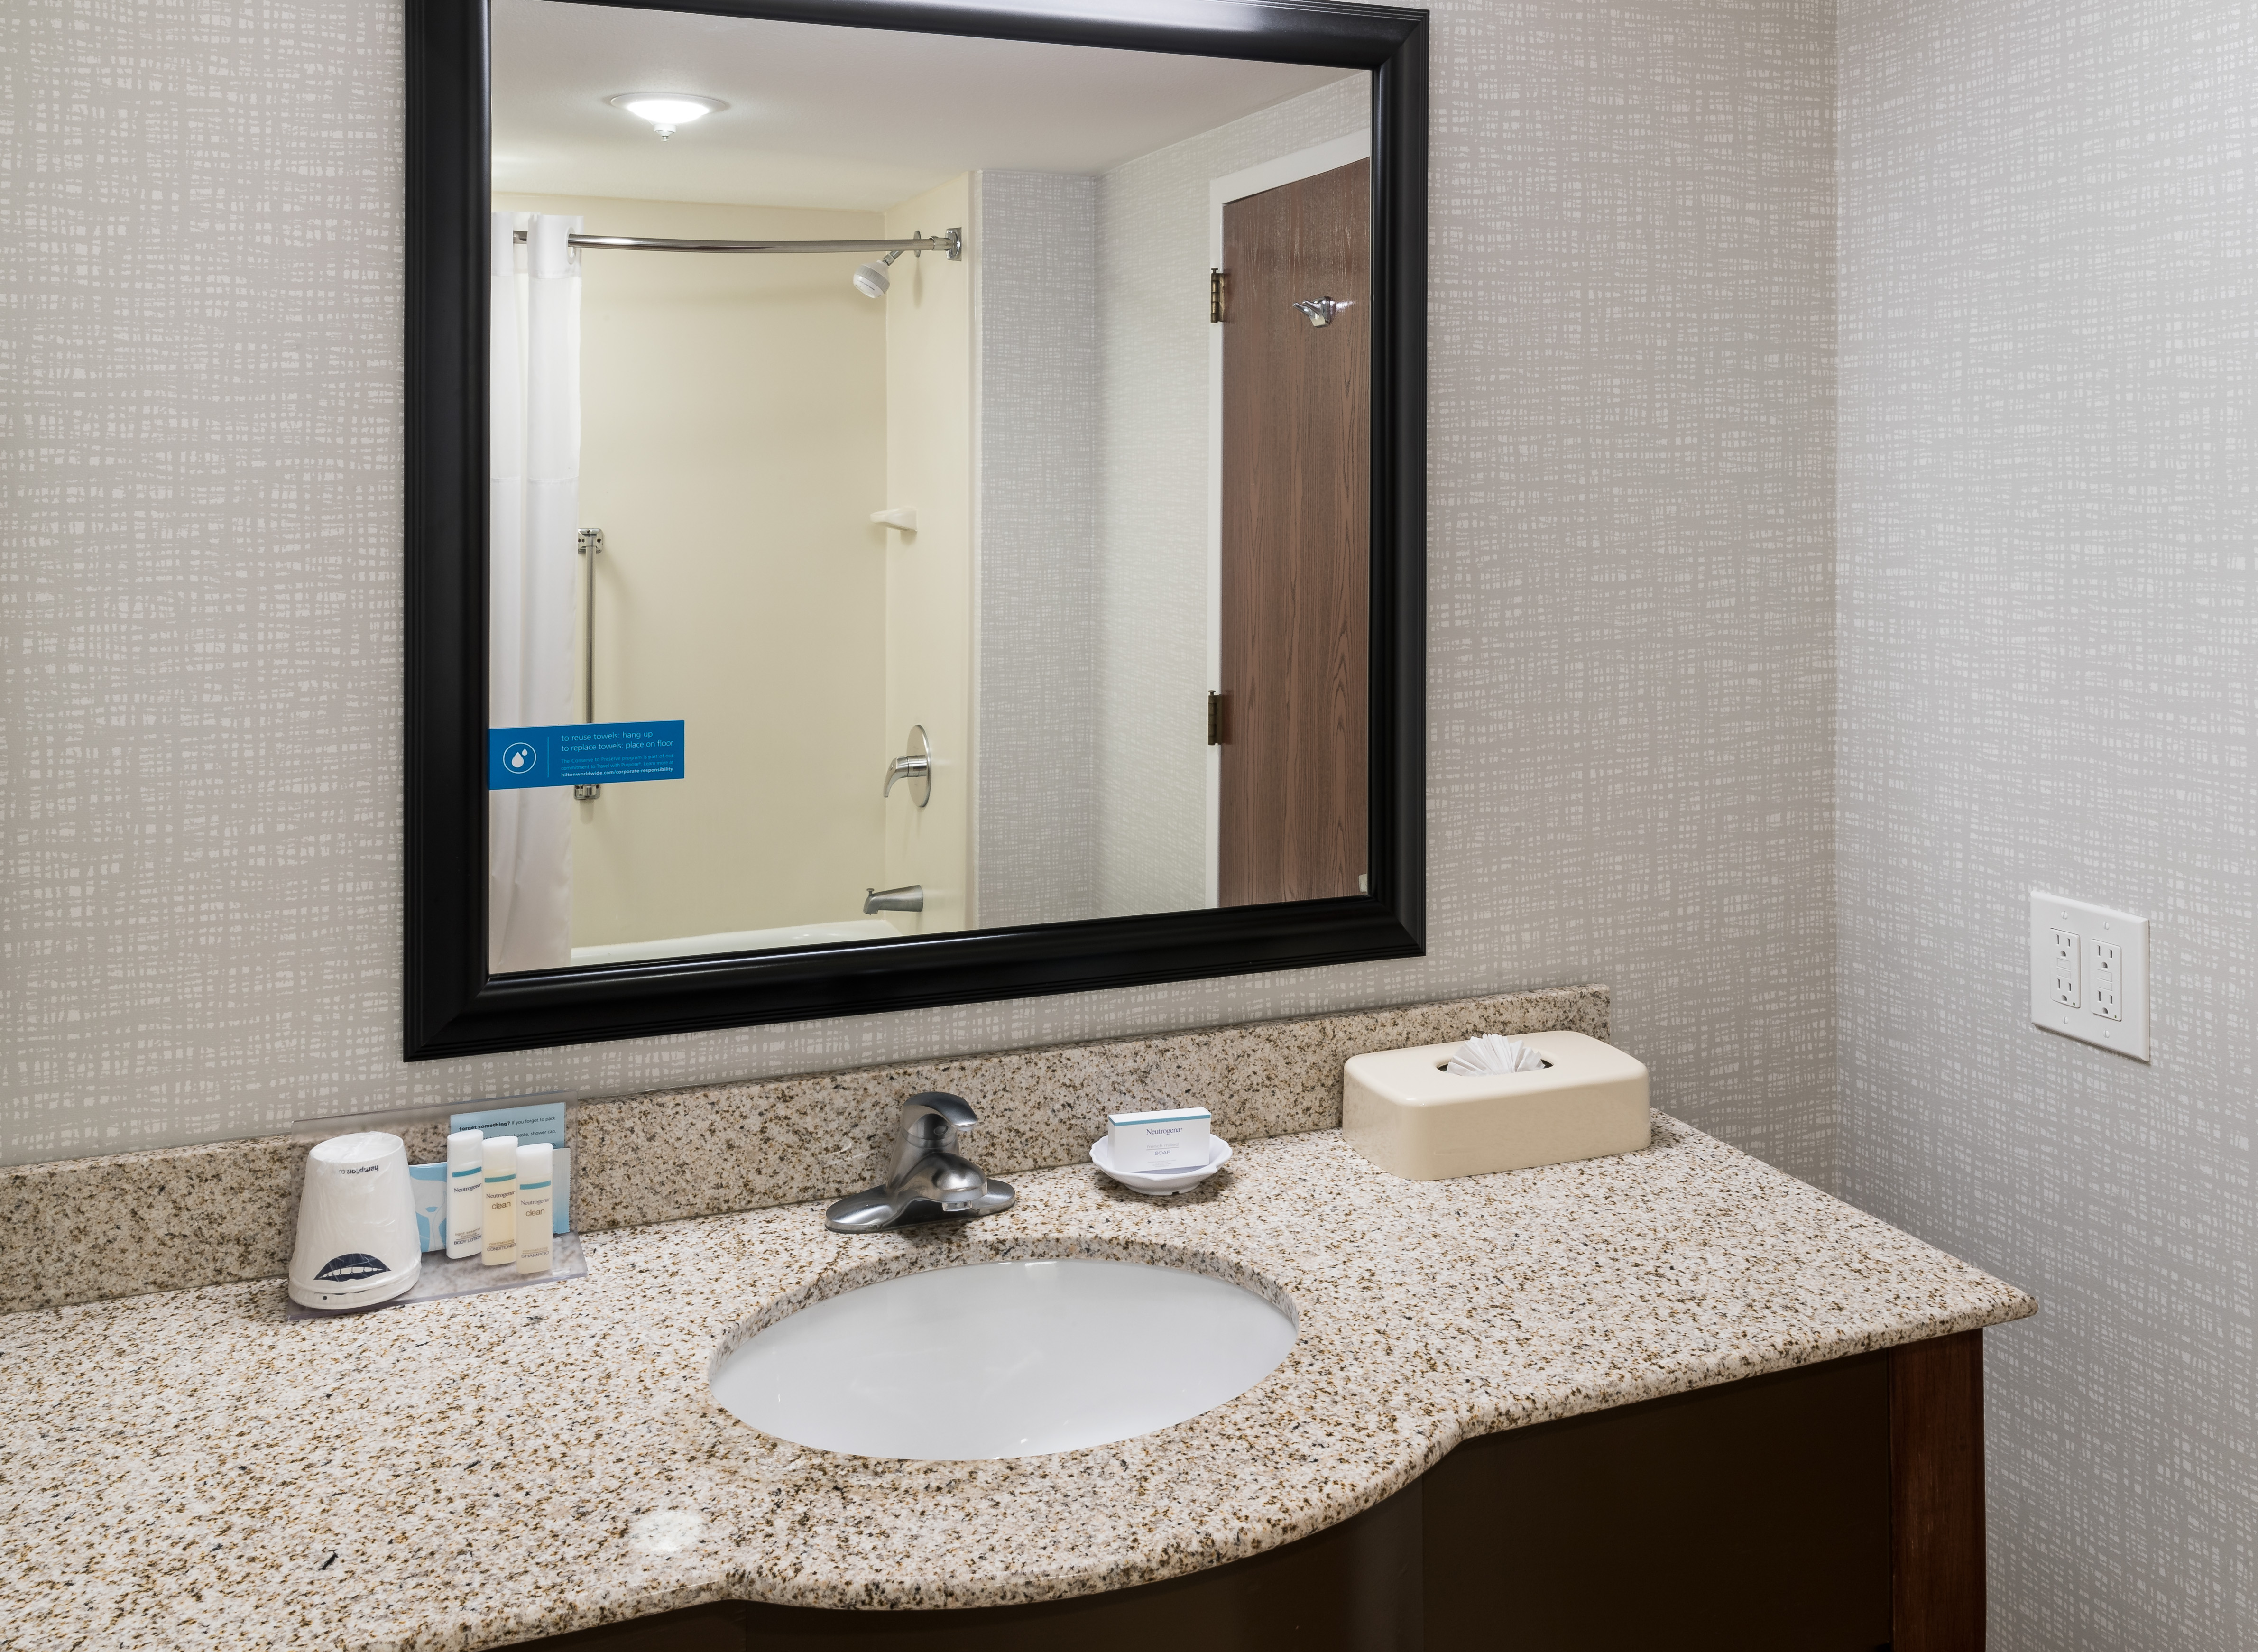 https://www.hotelsbyday.com/_data/default-hotel_image/4/23600/ahr-4274-chiskhx-049-kxwe.jpg